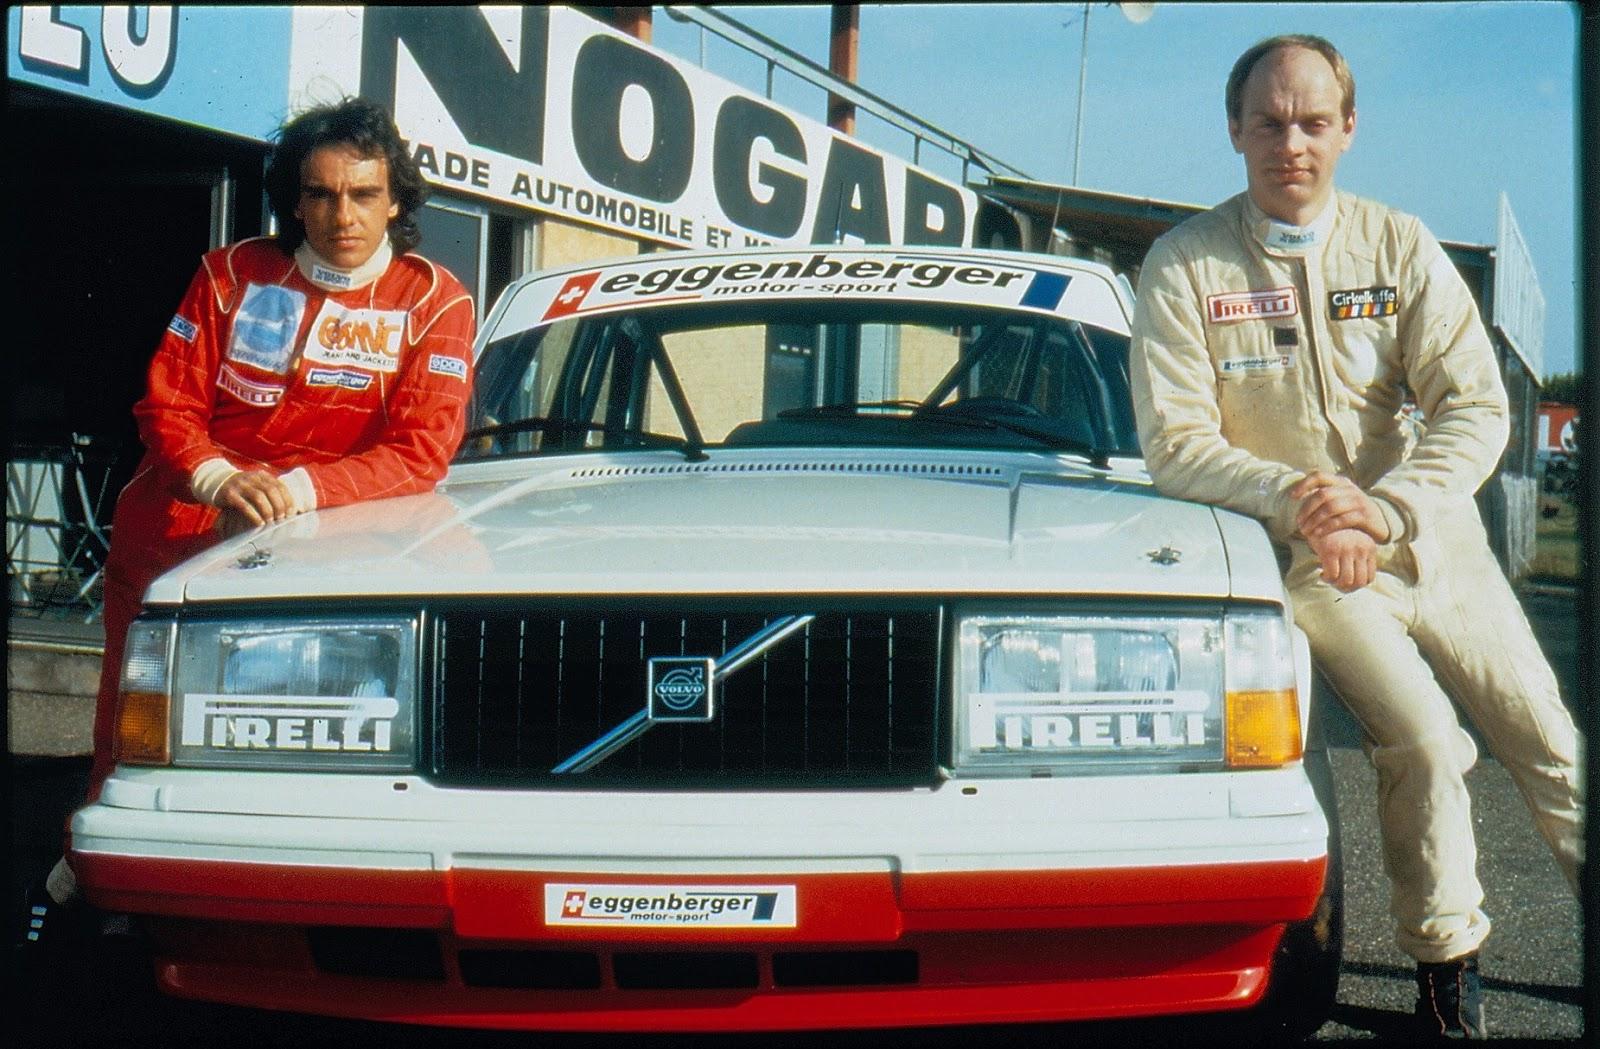 VOLVO VOLVO%2B240%2BTURBO%2BWINS%2BETCC%2B1985 2 Η Volvo στο WTCC με το S60 Polestar για να γιορτάσει το ένδοξο παρελθόν του Volvo 240 Turbo